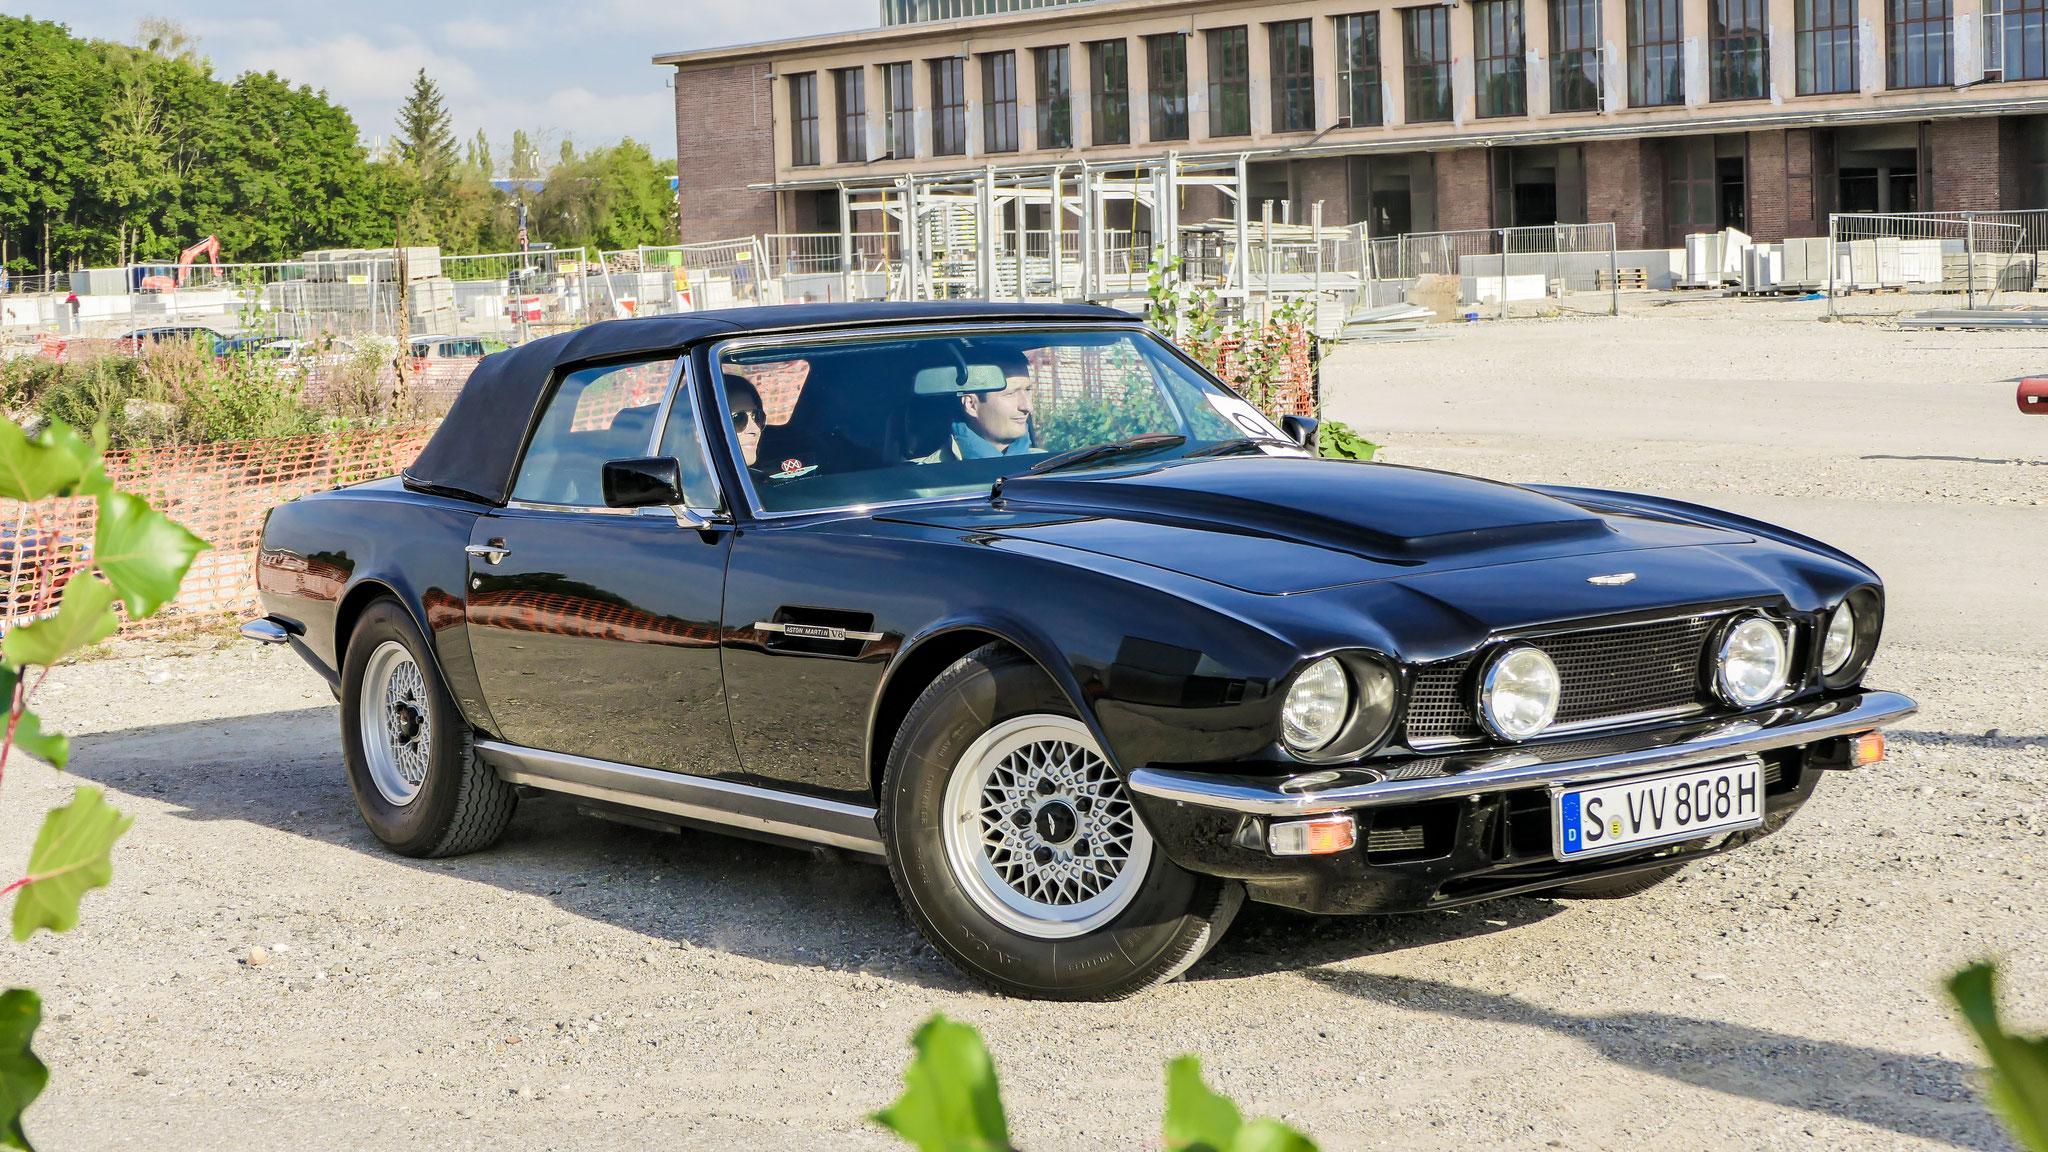 Aston Martin V8 Vantage - S-VV-808H